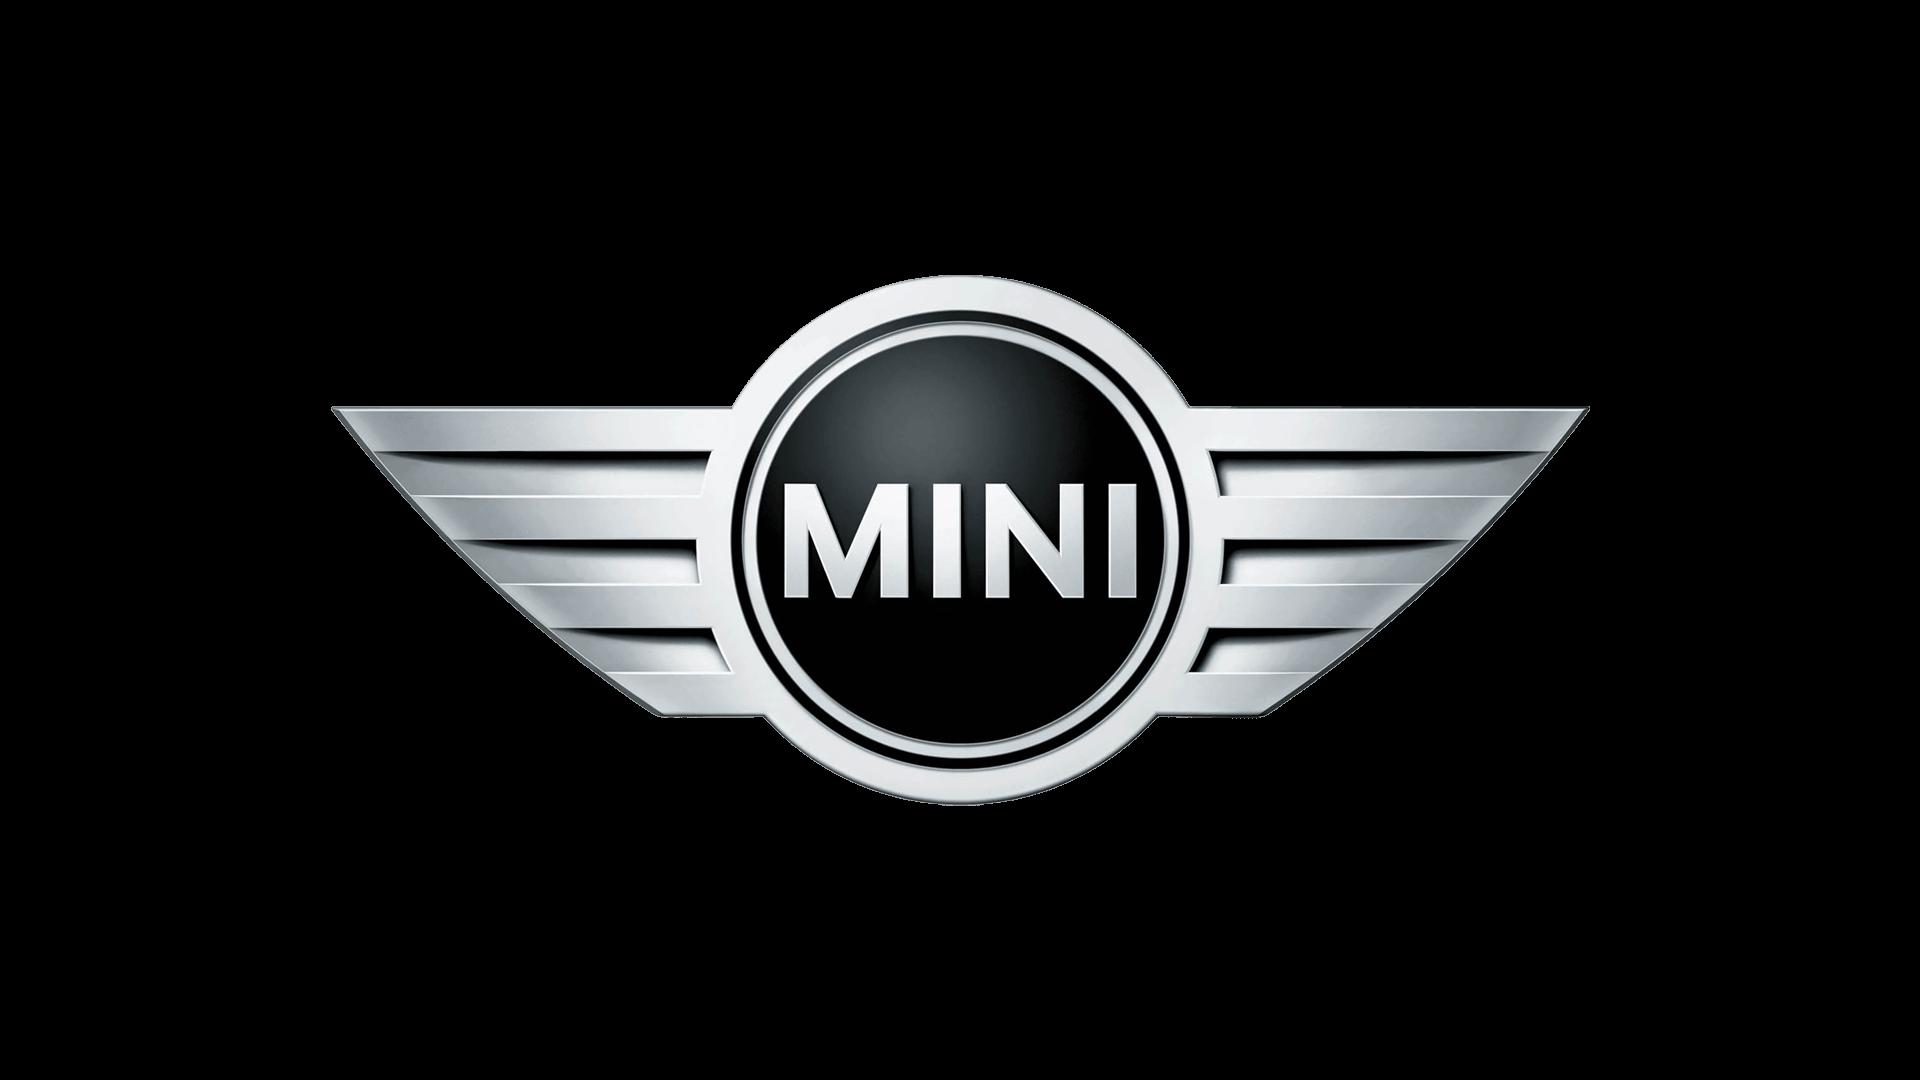 Bmw Car Logo Images Cars Image 2018